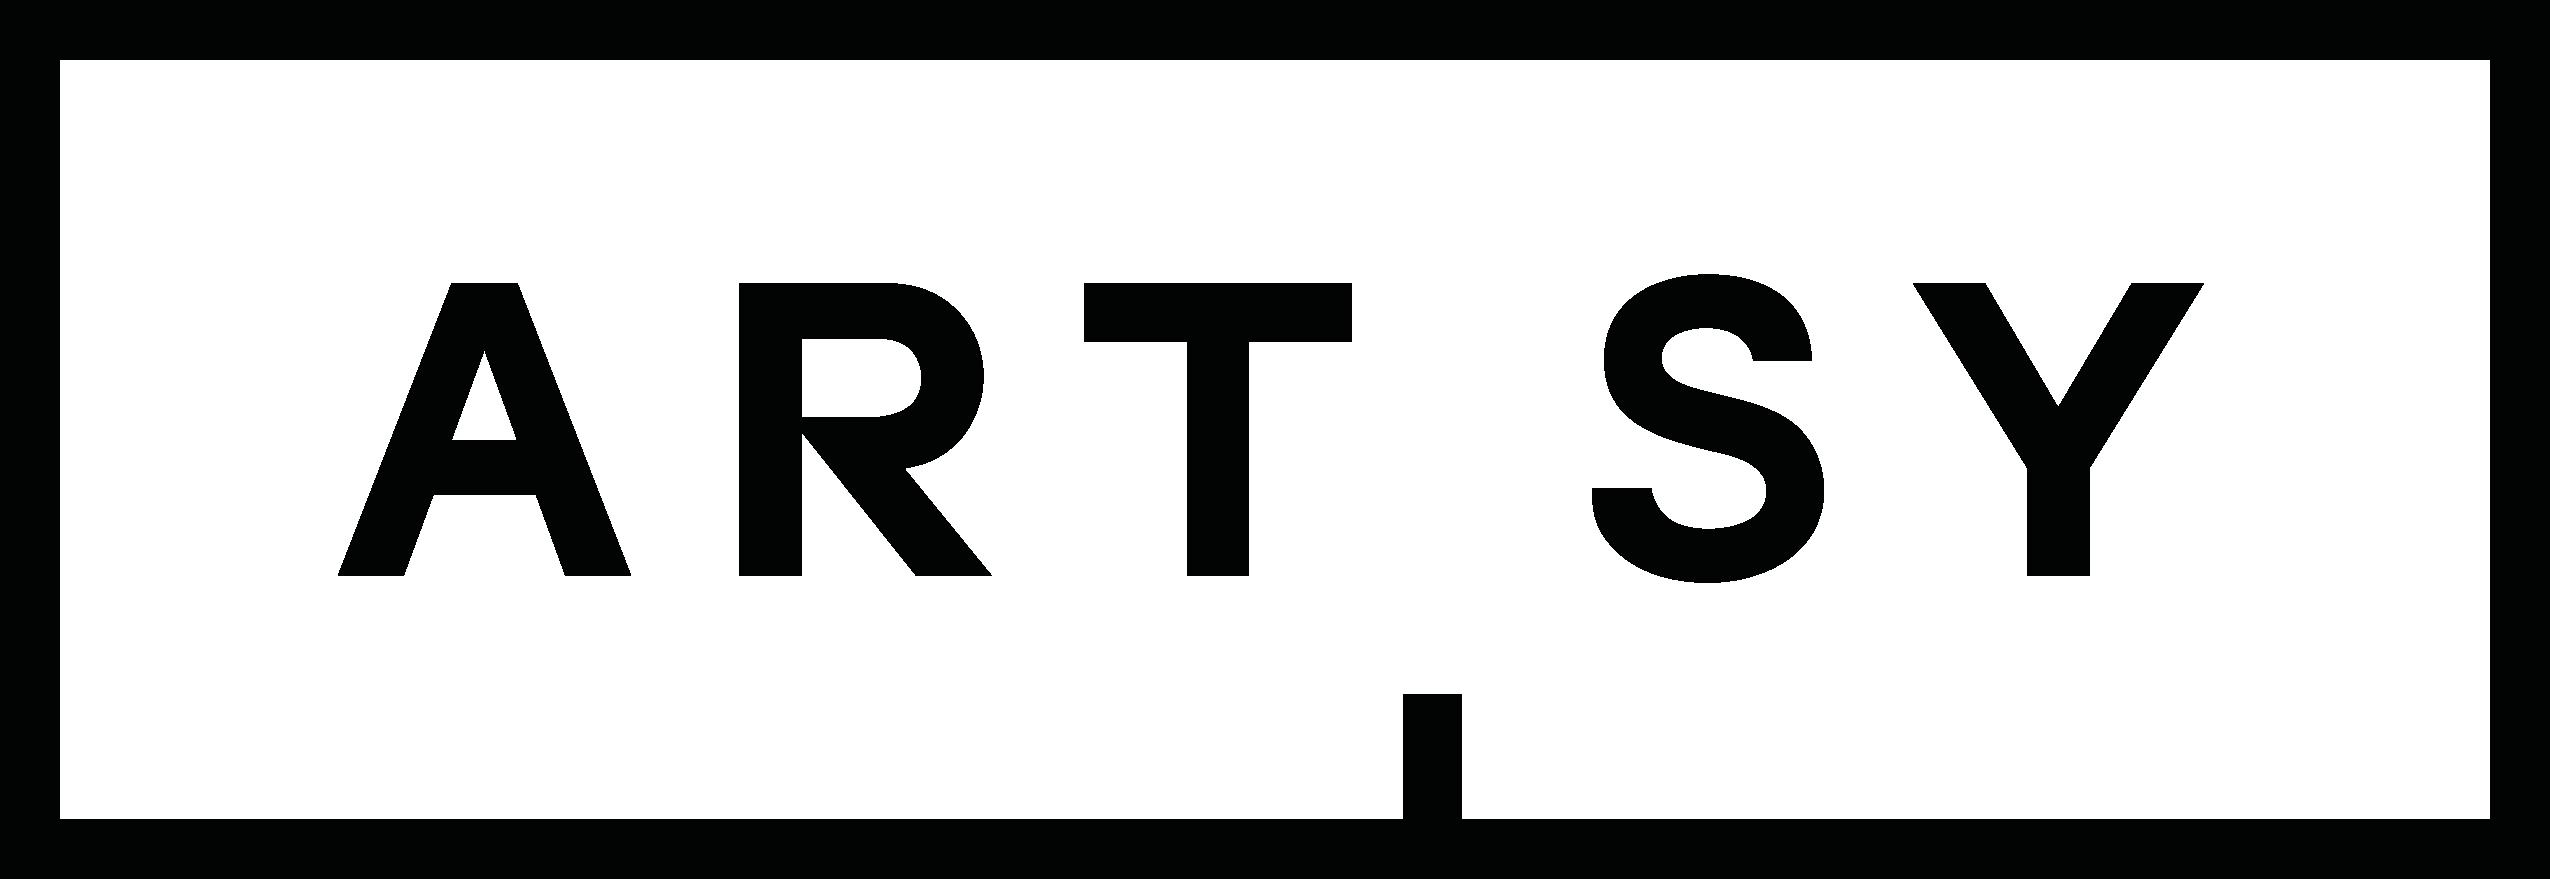 Image result for artsy logo